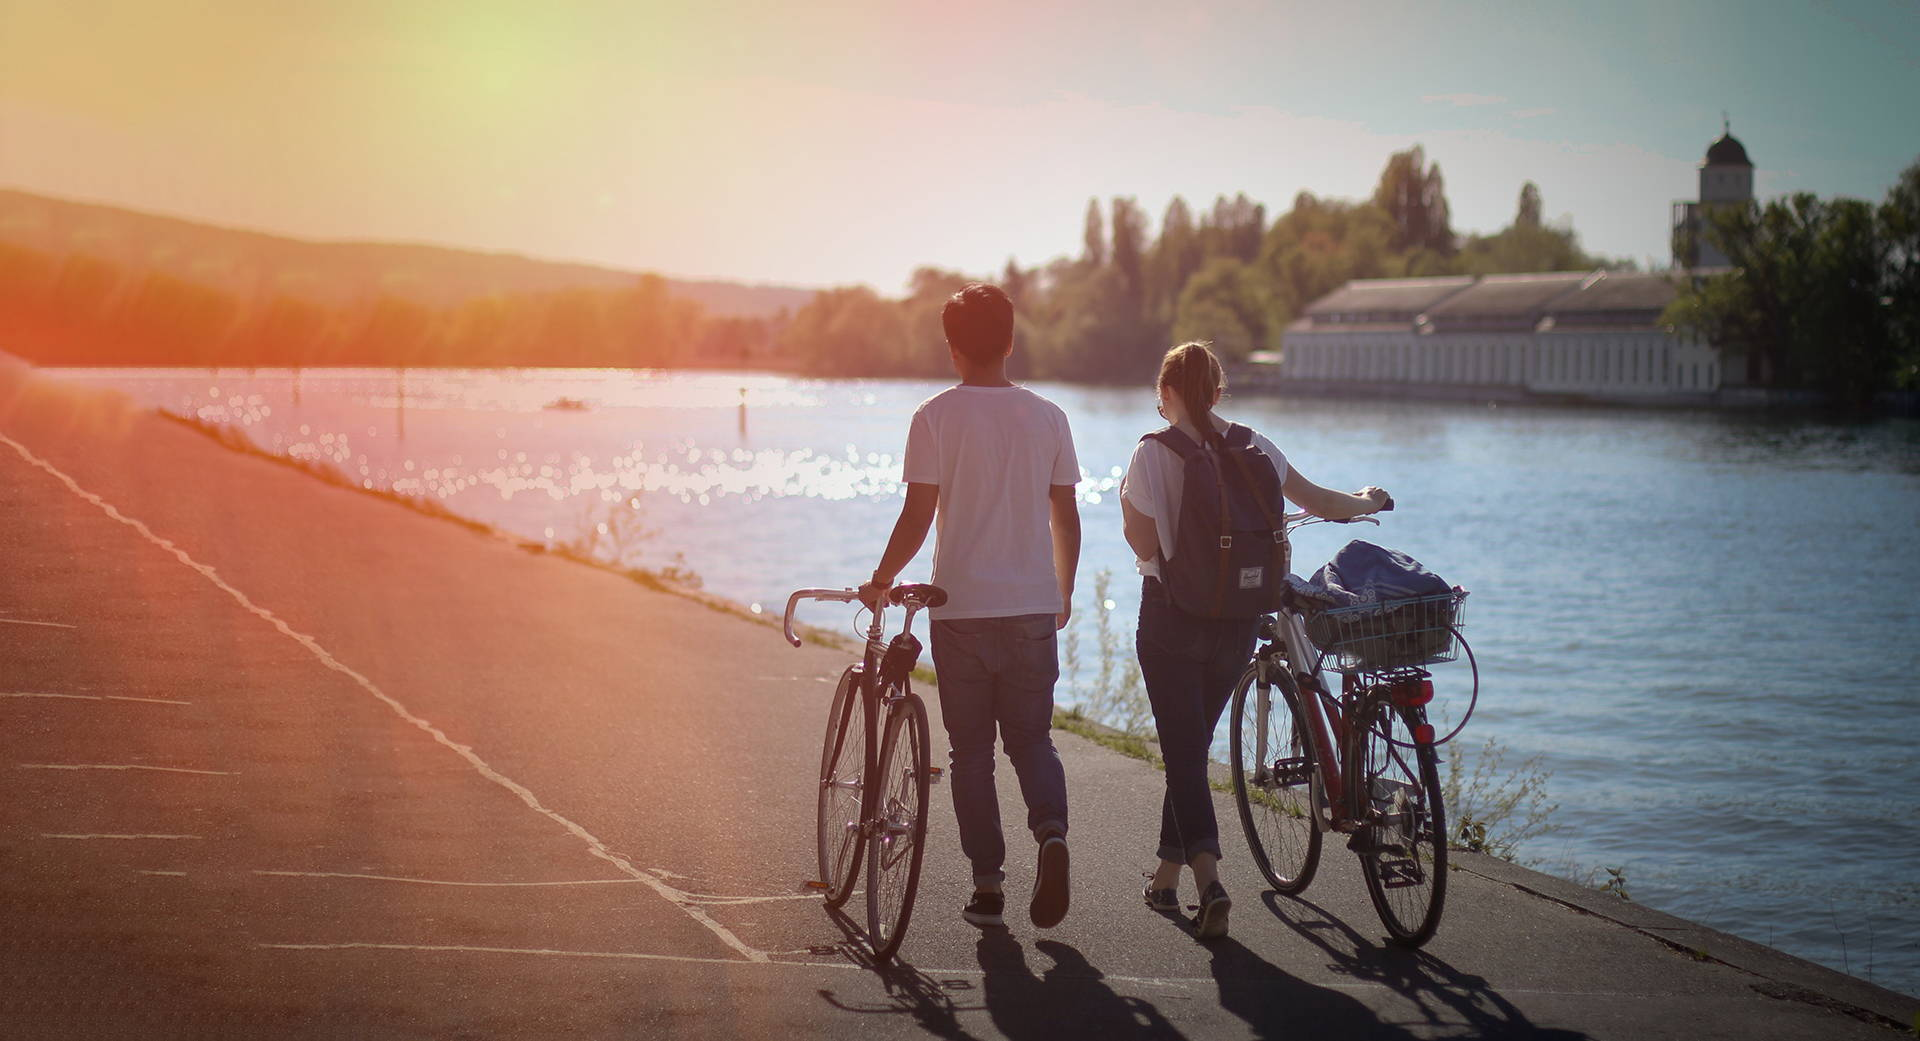 2 bicyclist leading their bikes